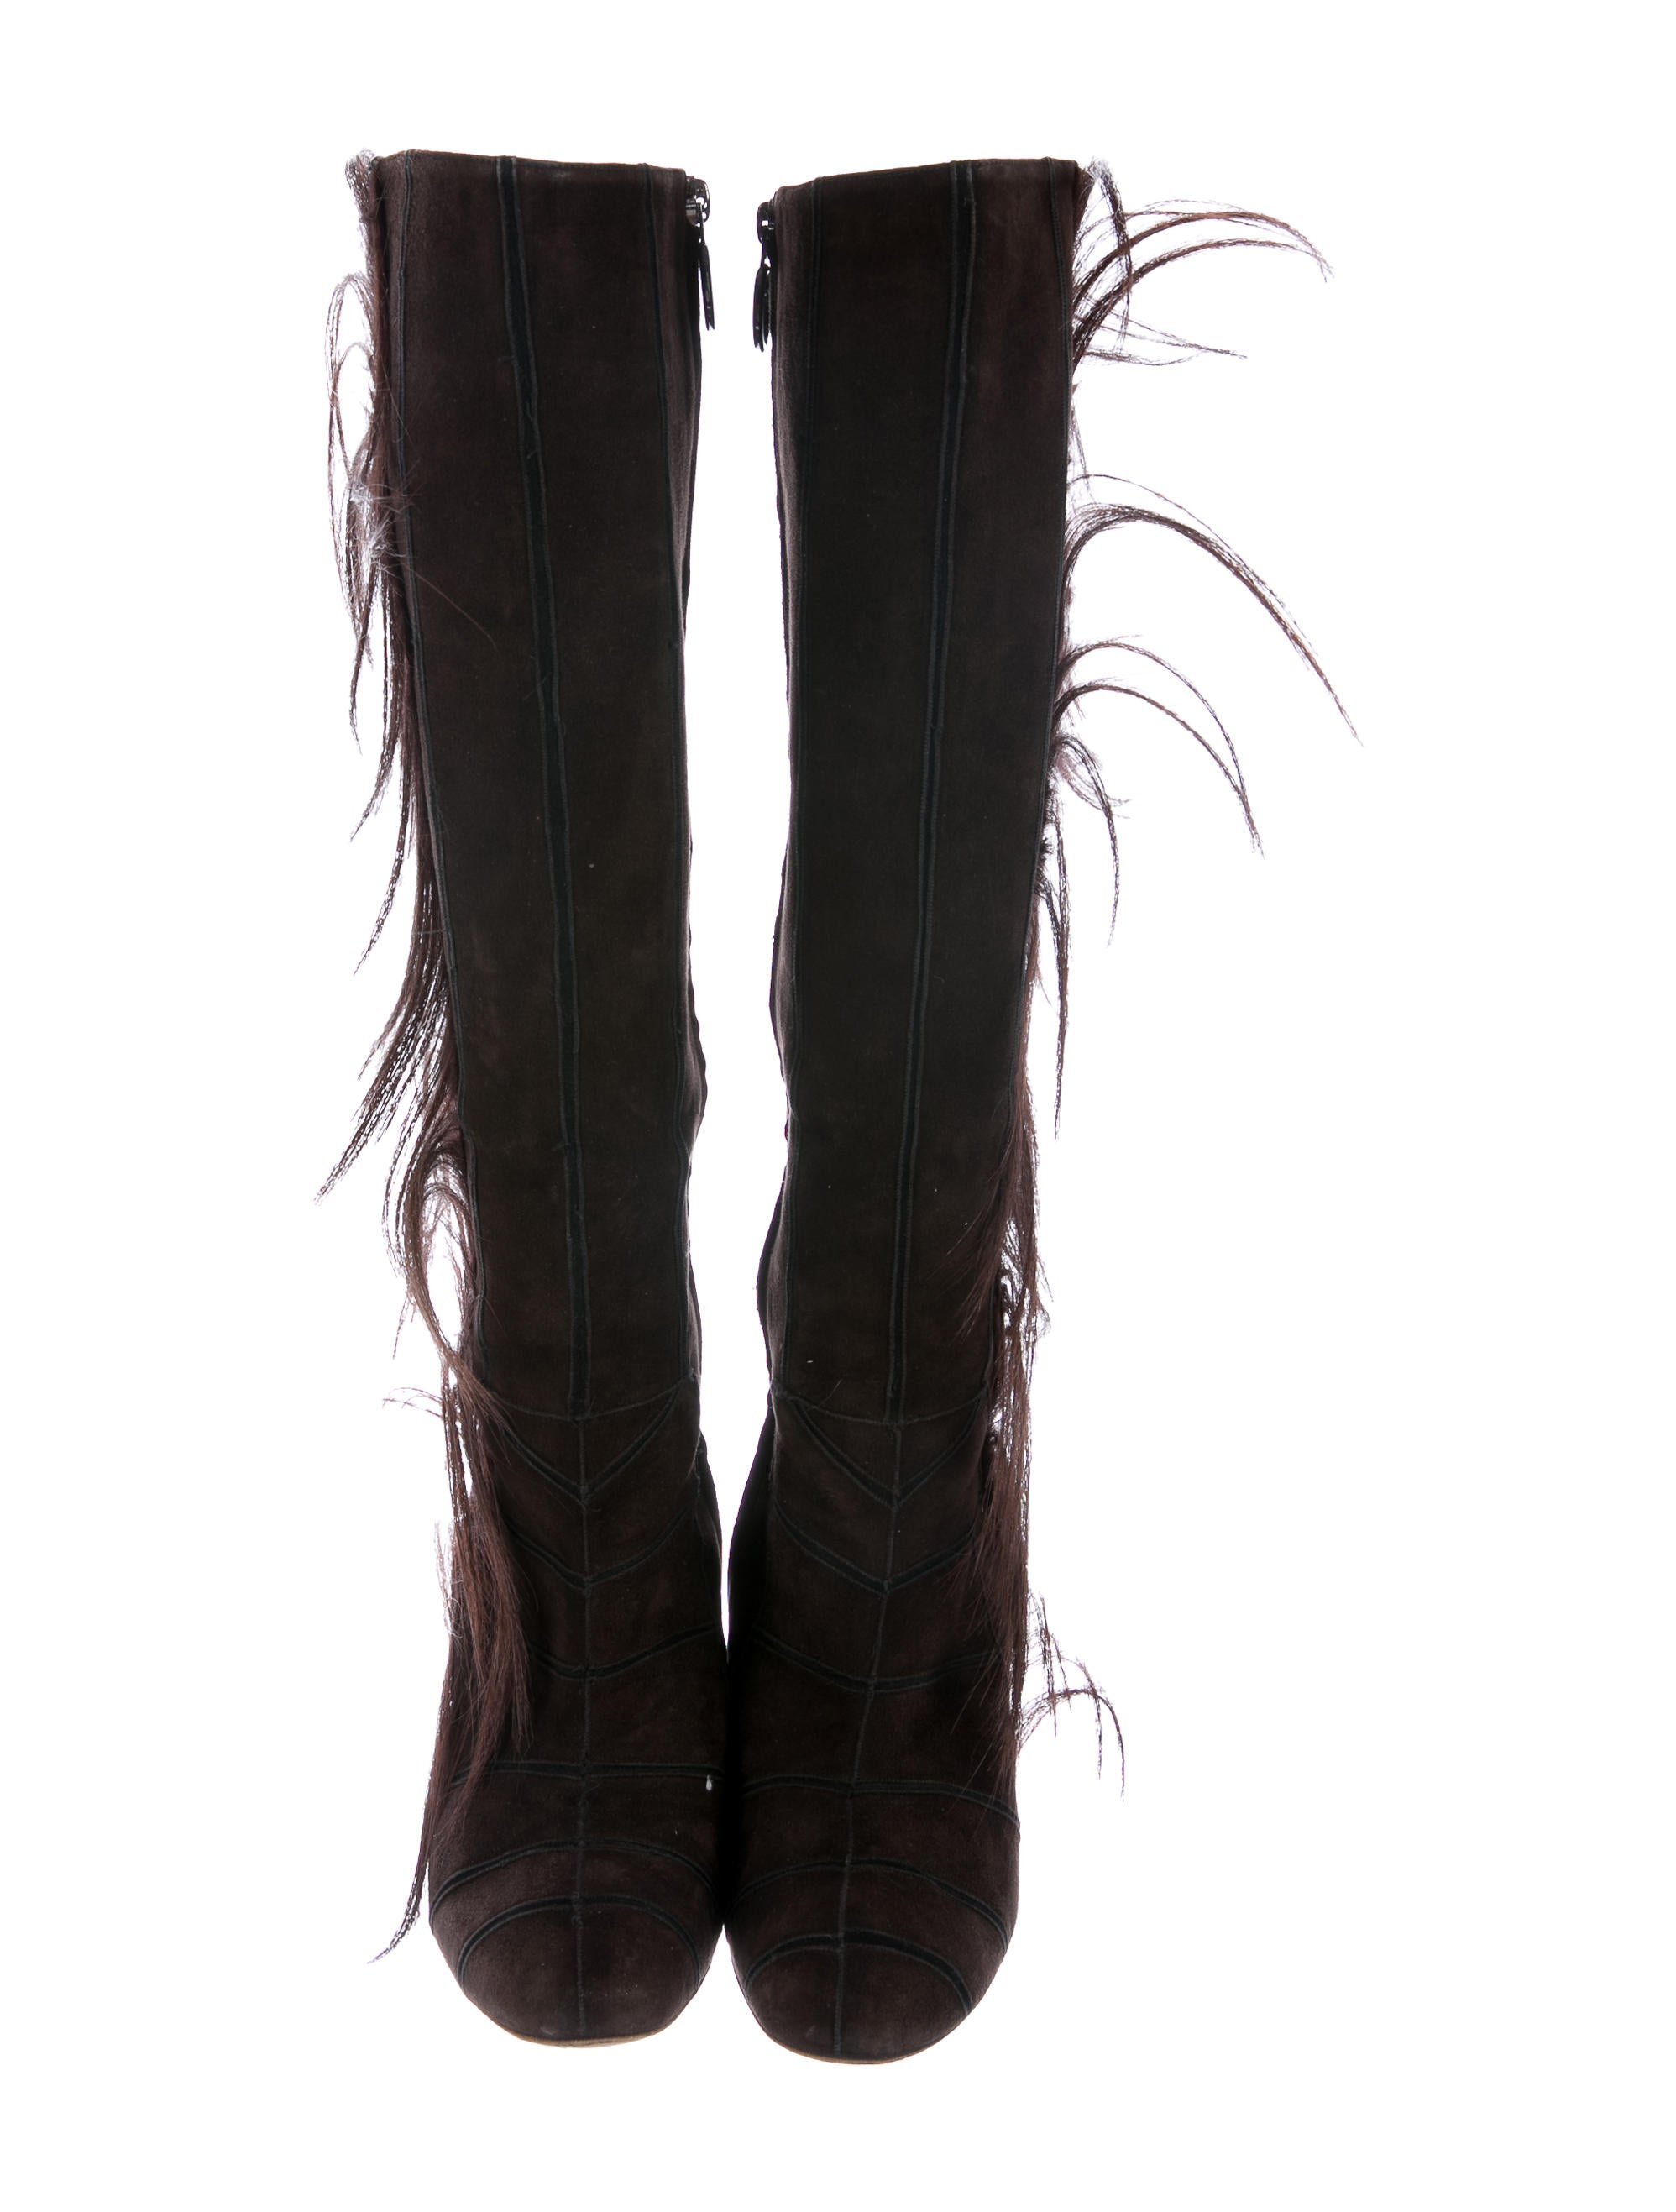 Fendi Goat-Hair Knee-High Boots free shipping nicekicks cheap sale original under 70 dollars DWh4CzImh0